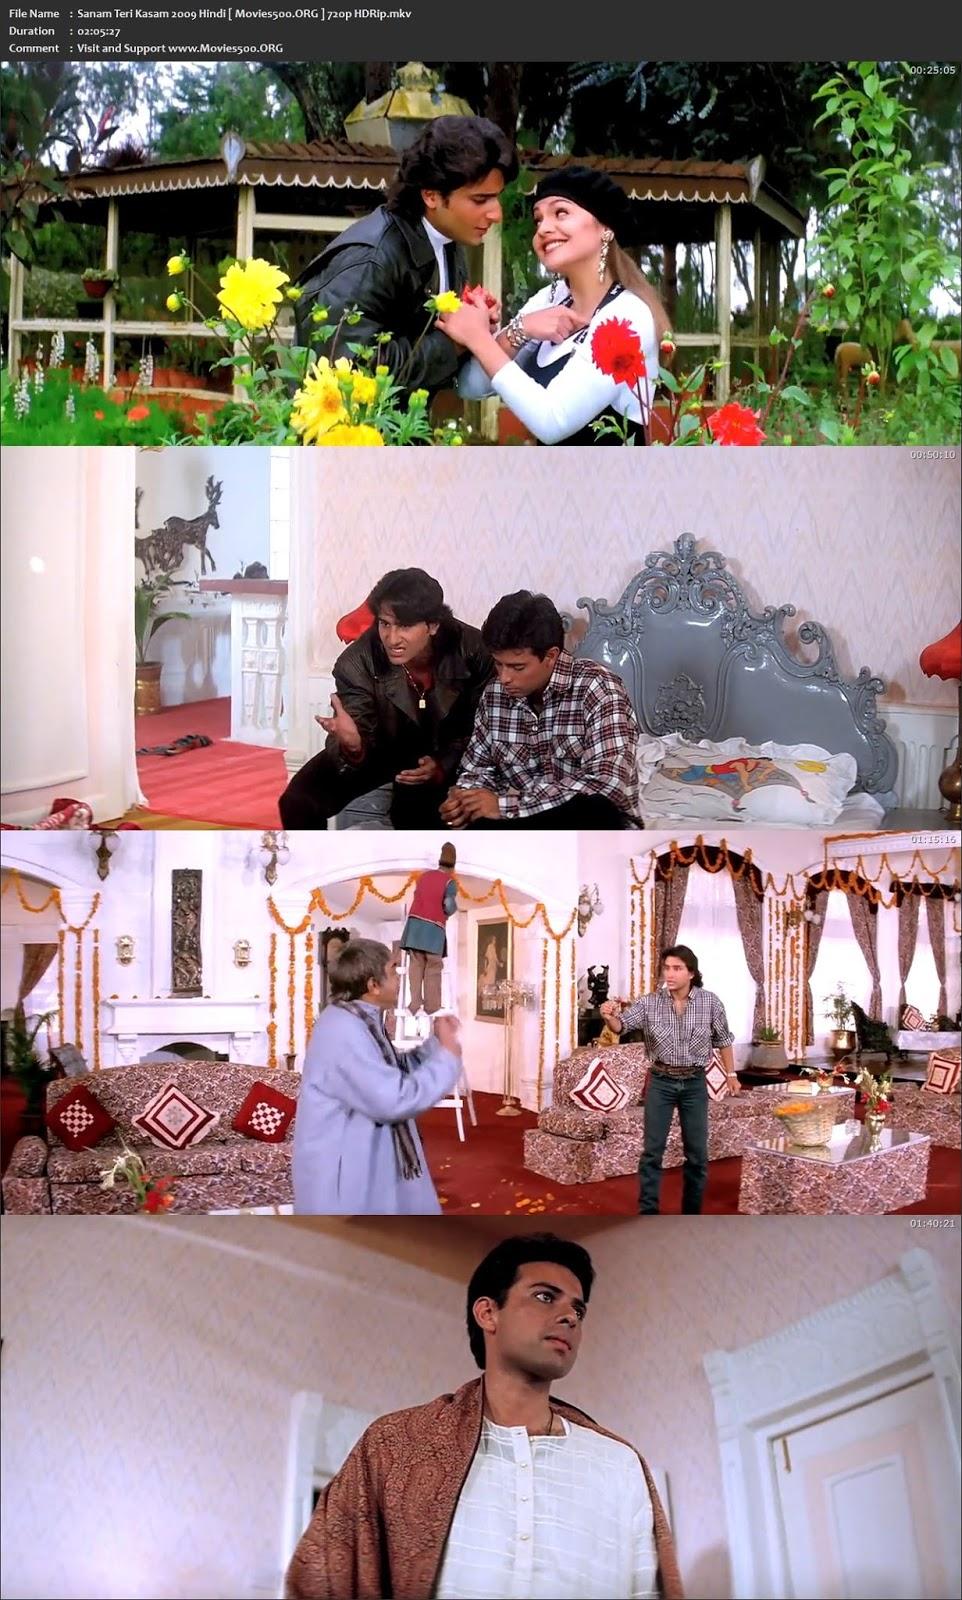 Sanam Teri Kasam 2009 Hindi Full Movie HDRip 720p at movies500.info